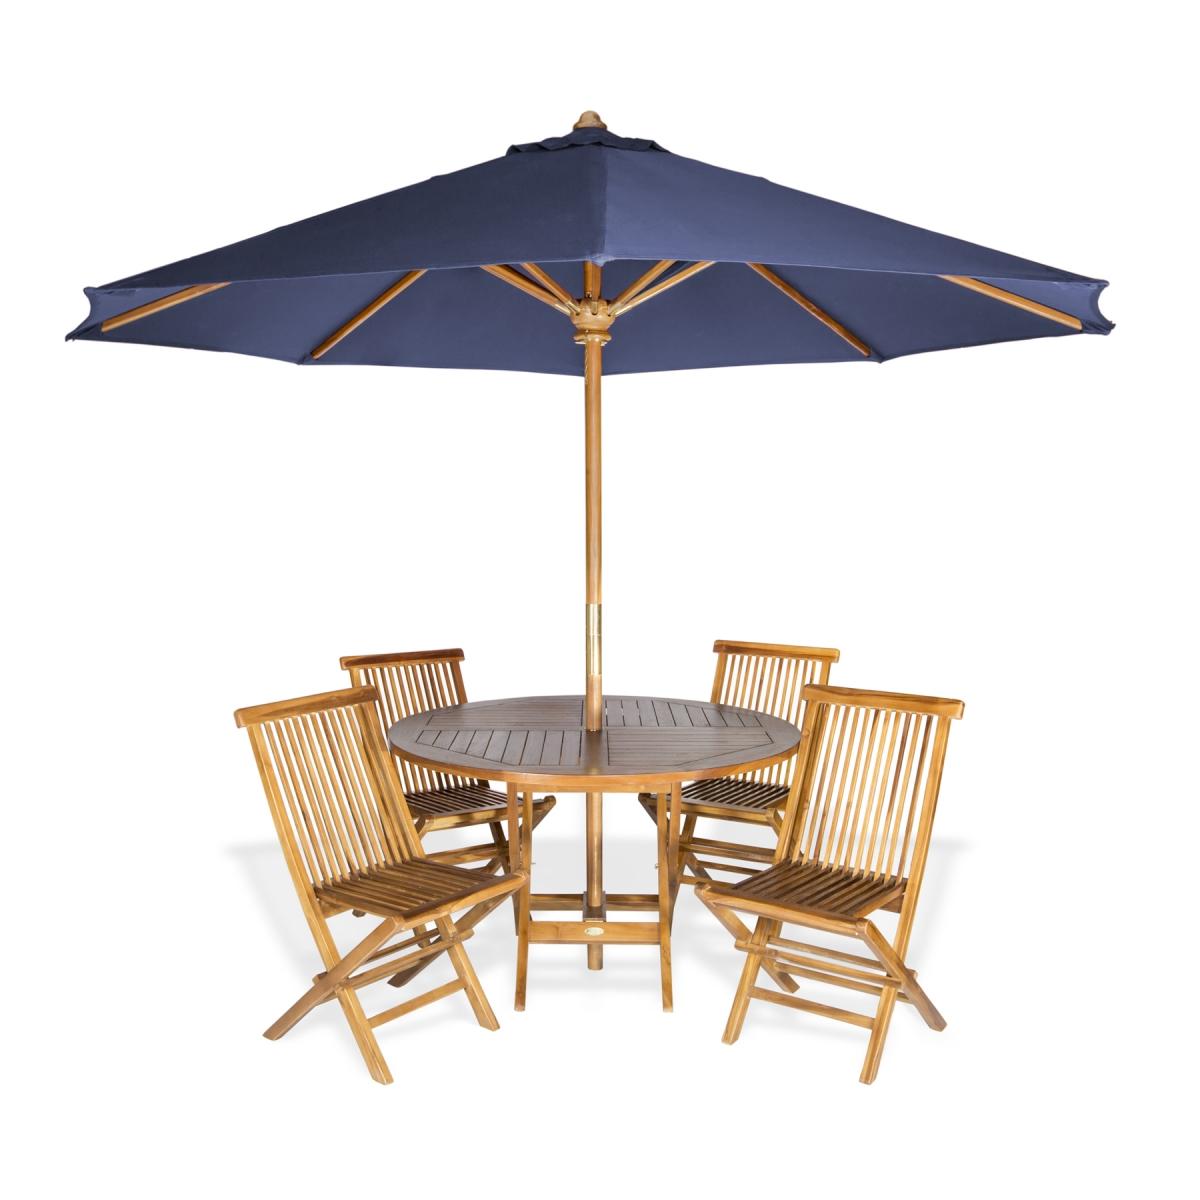 6-Piece Round Folding Table Set & Umbrella, Blue - All Things Cedar TT6P-R-B